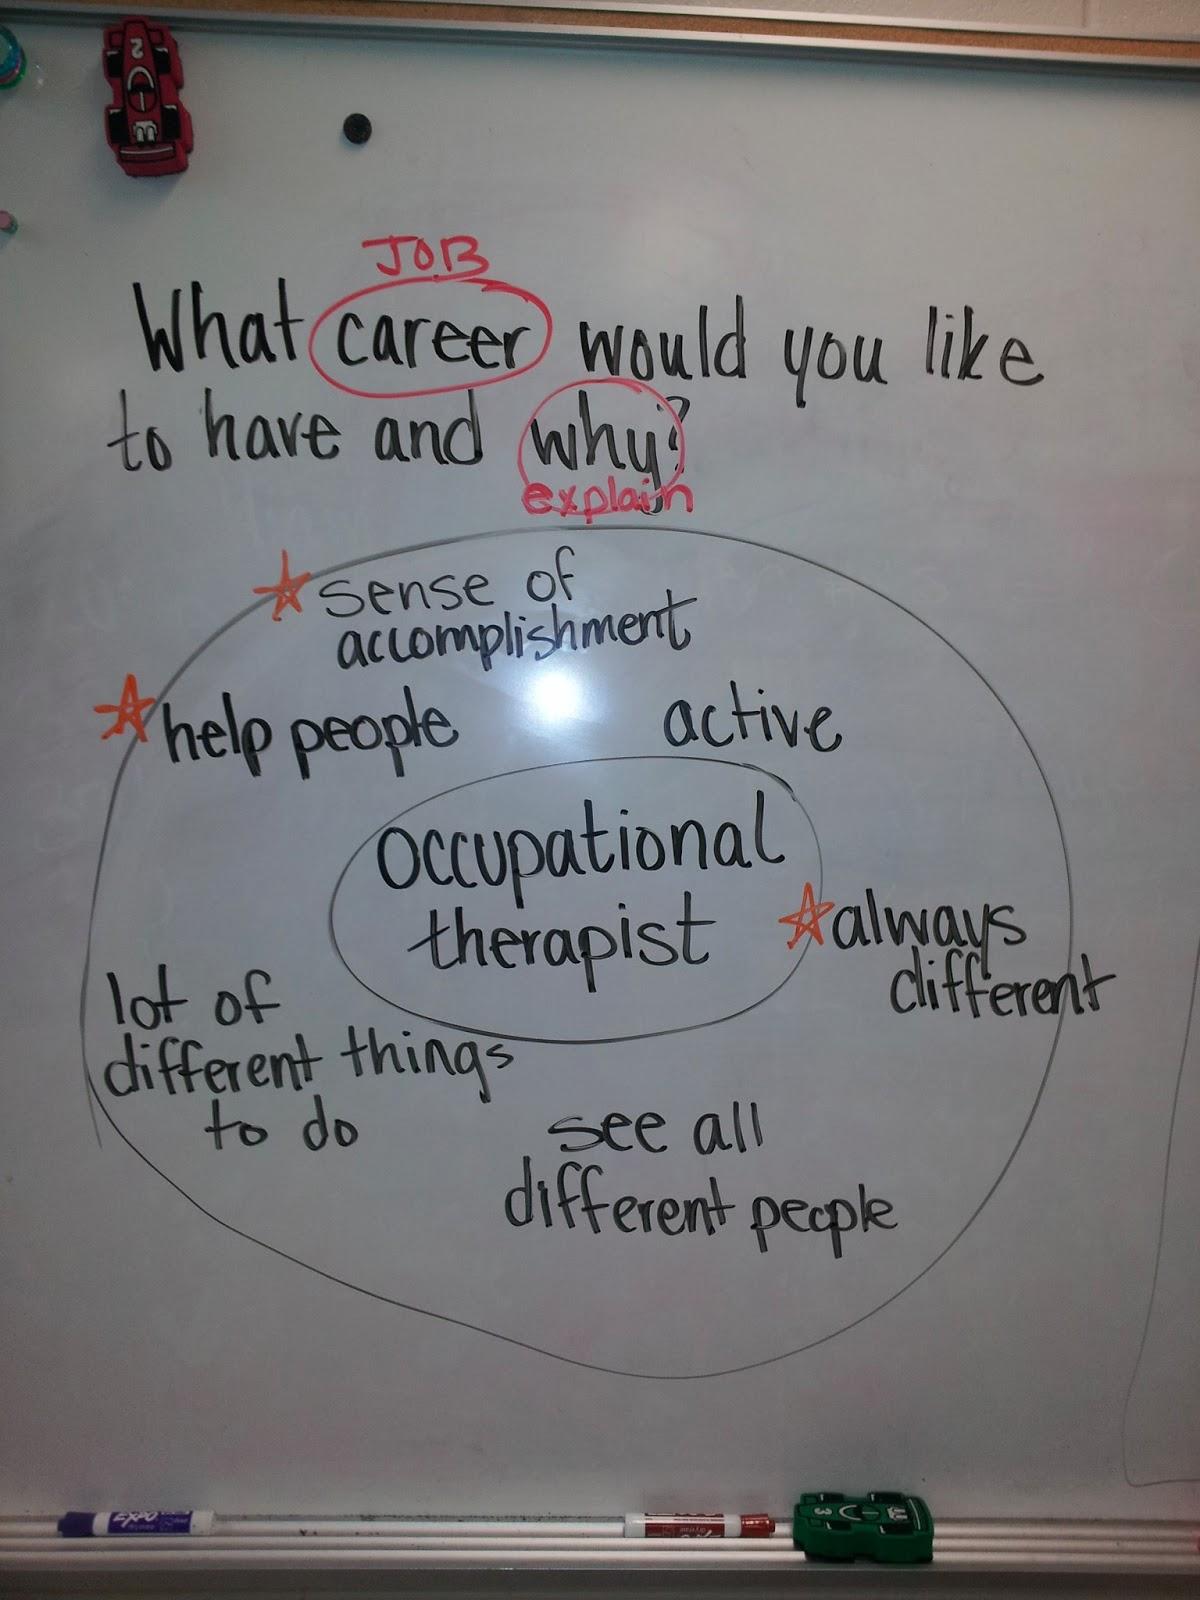 expository essays careers pdfeports867 web fc2 com expository essays careers